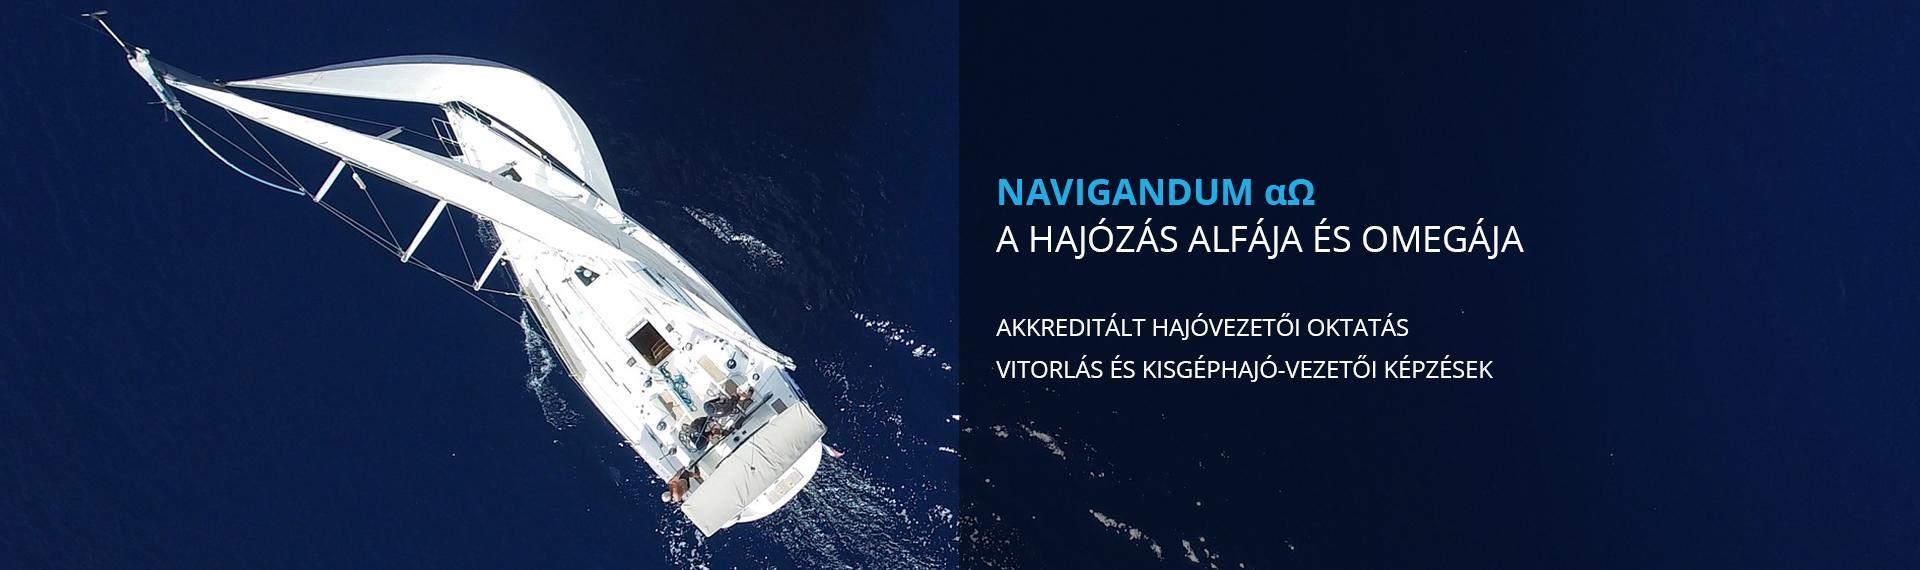 navigandum-header-pc-001.jpg